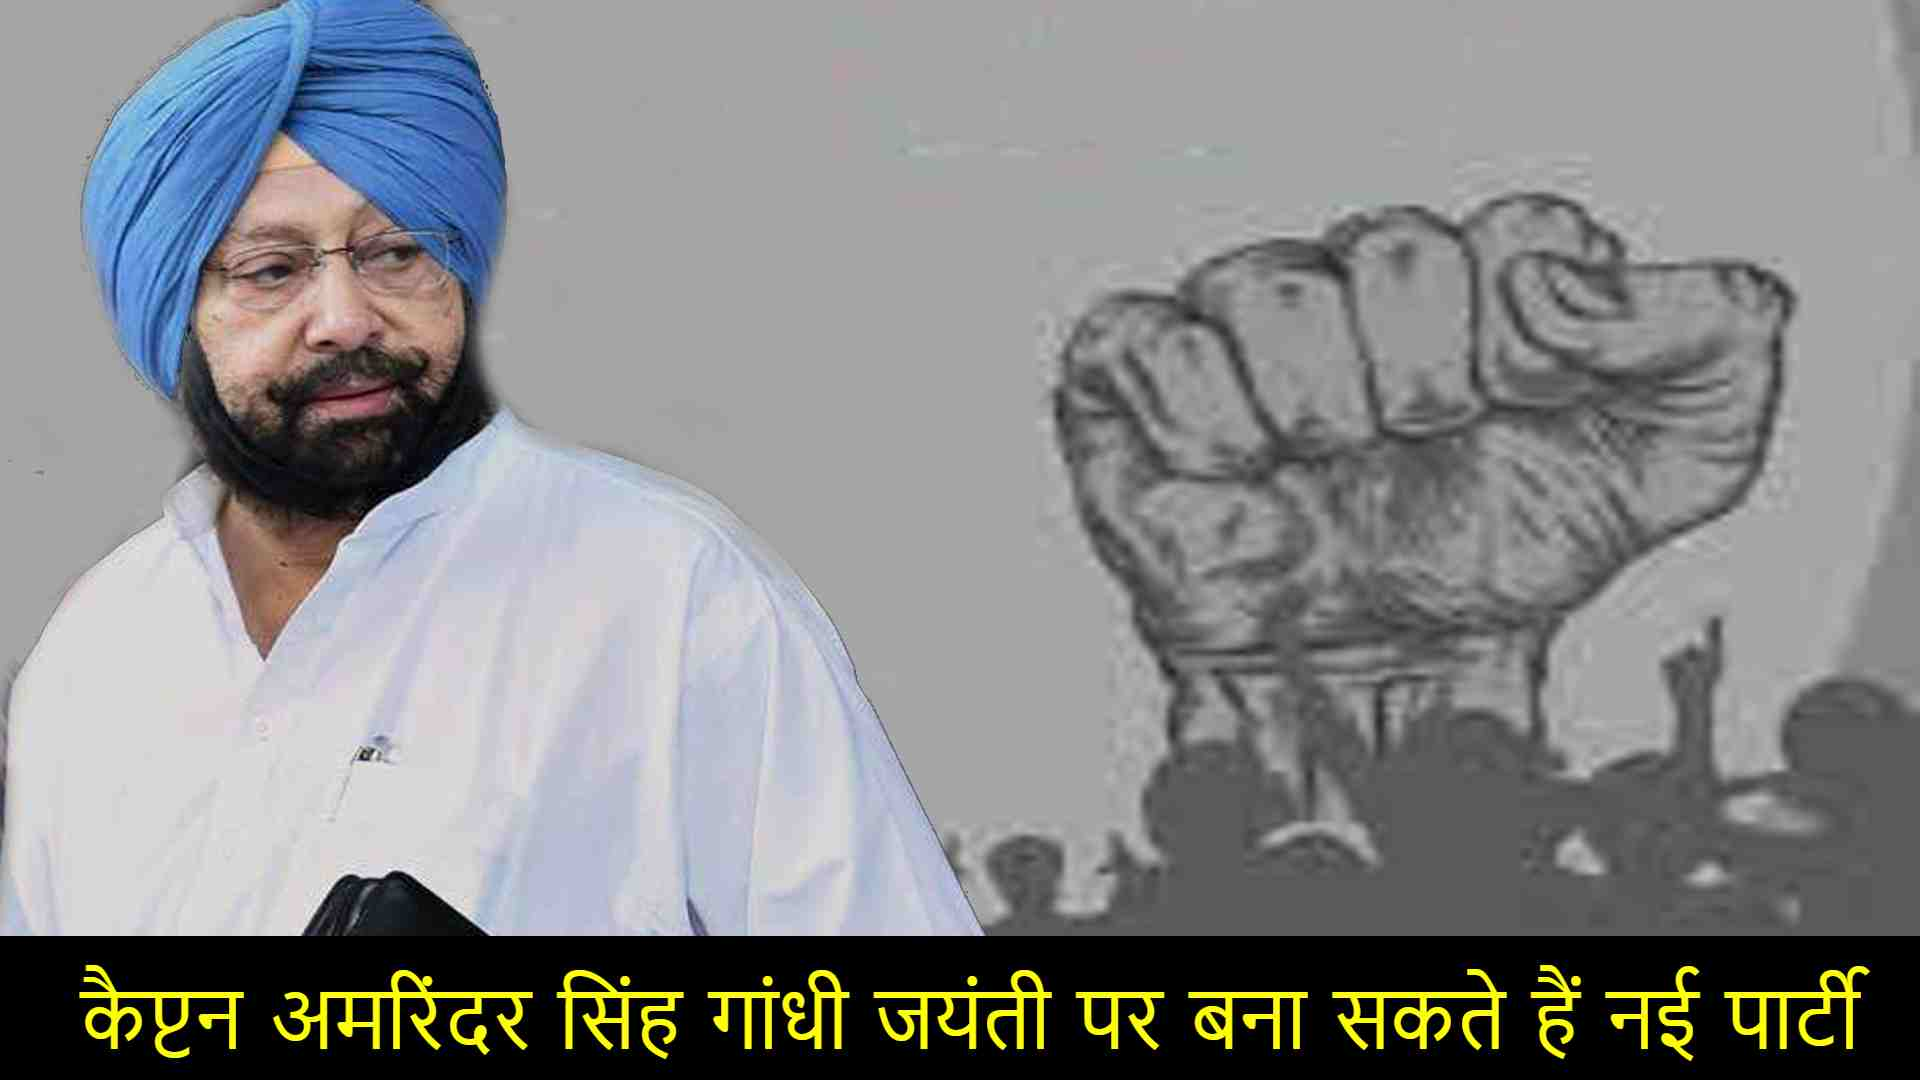 Capt Amarinder Singh may form a new party on Gandhi Jayanti